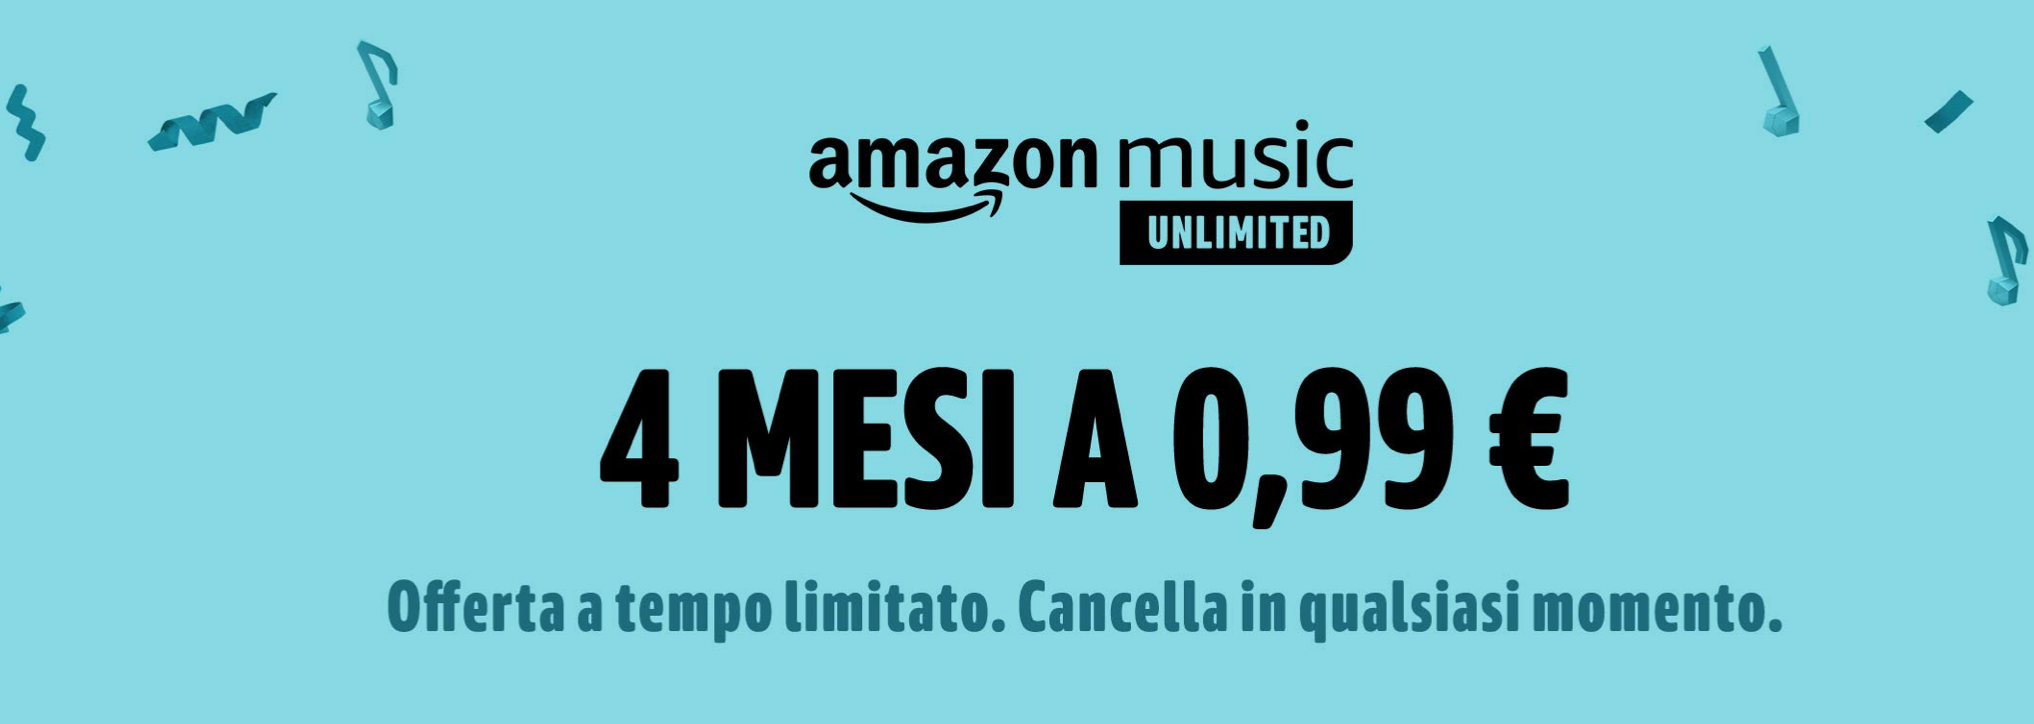 Amazon Music Unlimited offerta Prime Day 2019